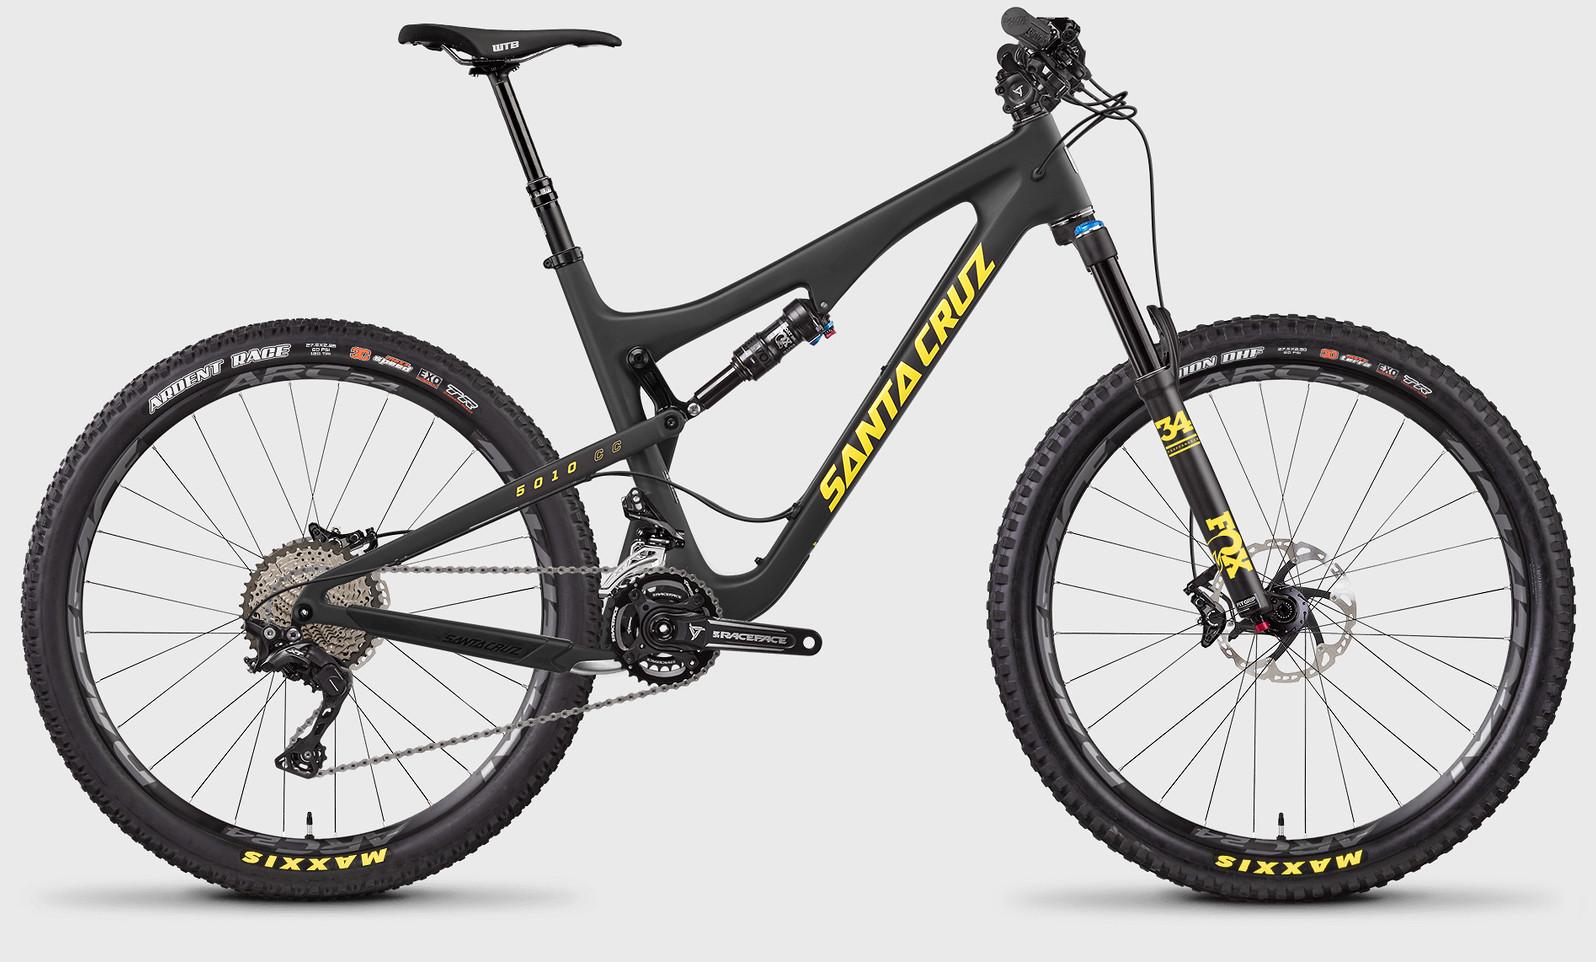 2017 Santa Cruz 5010 Carbon Cc Xt Bike Reviews